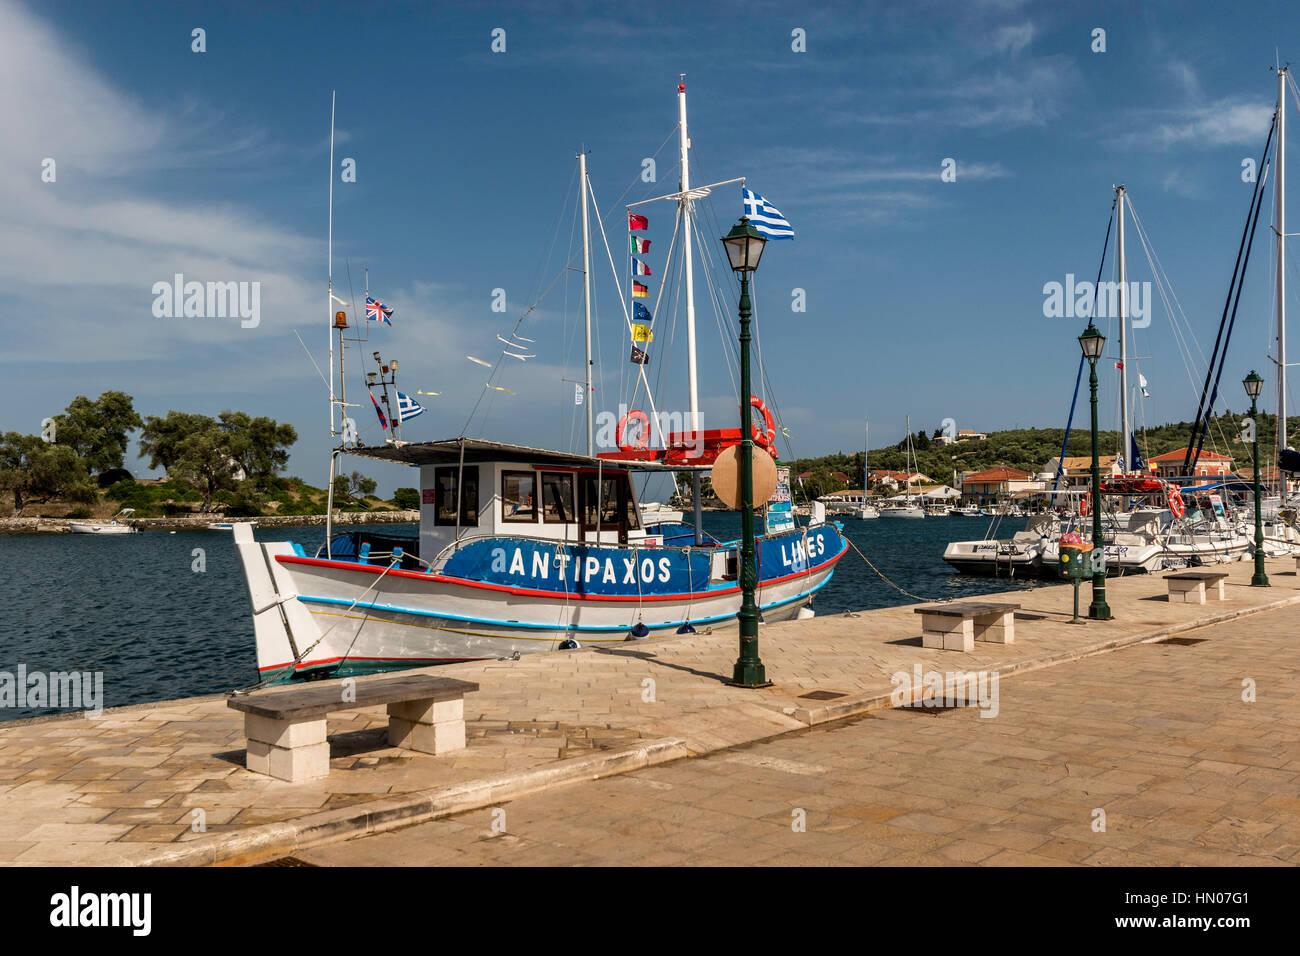 Anti Paxos tourist day trip boat - Stock Image